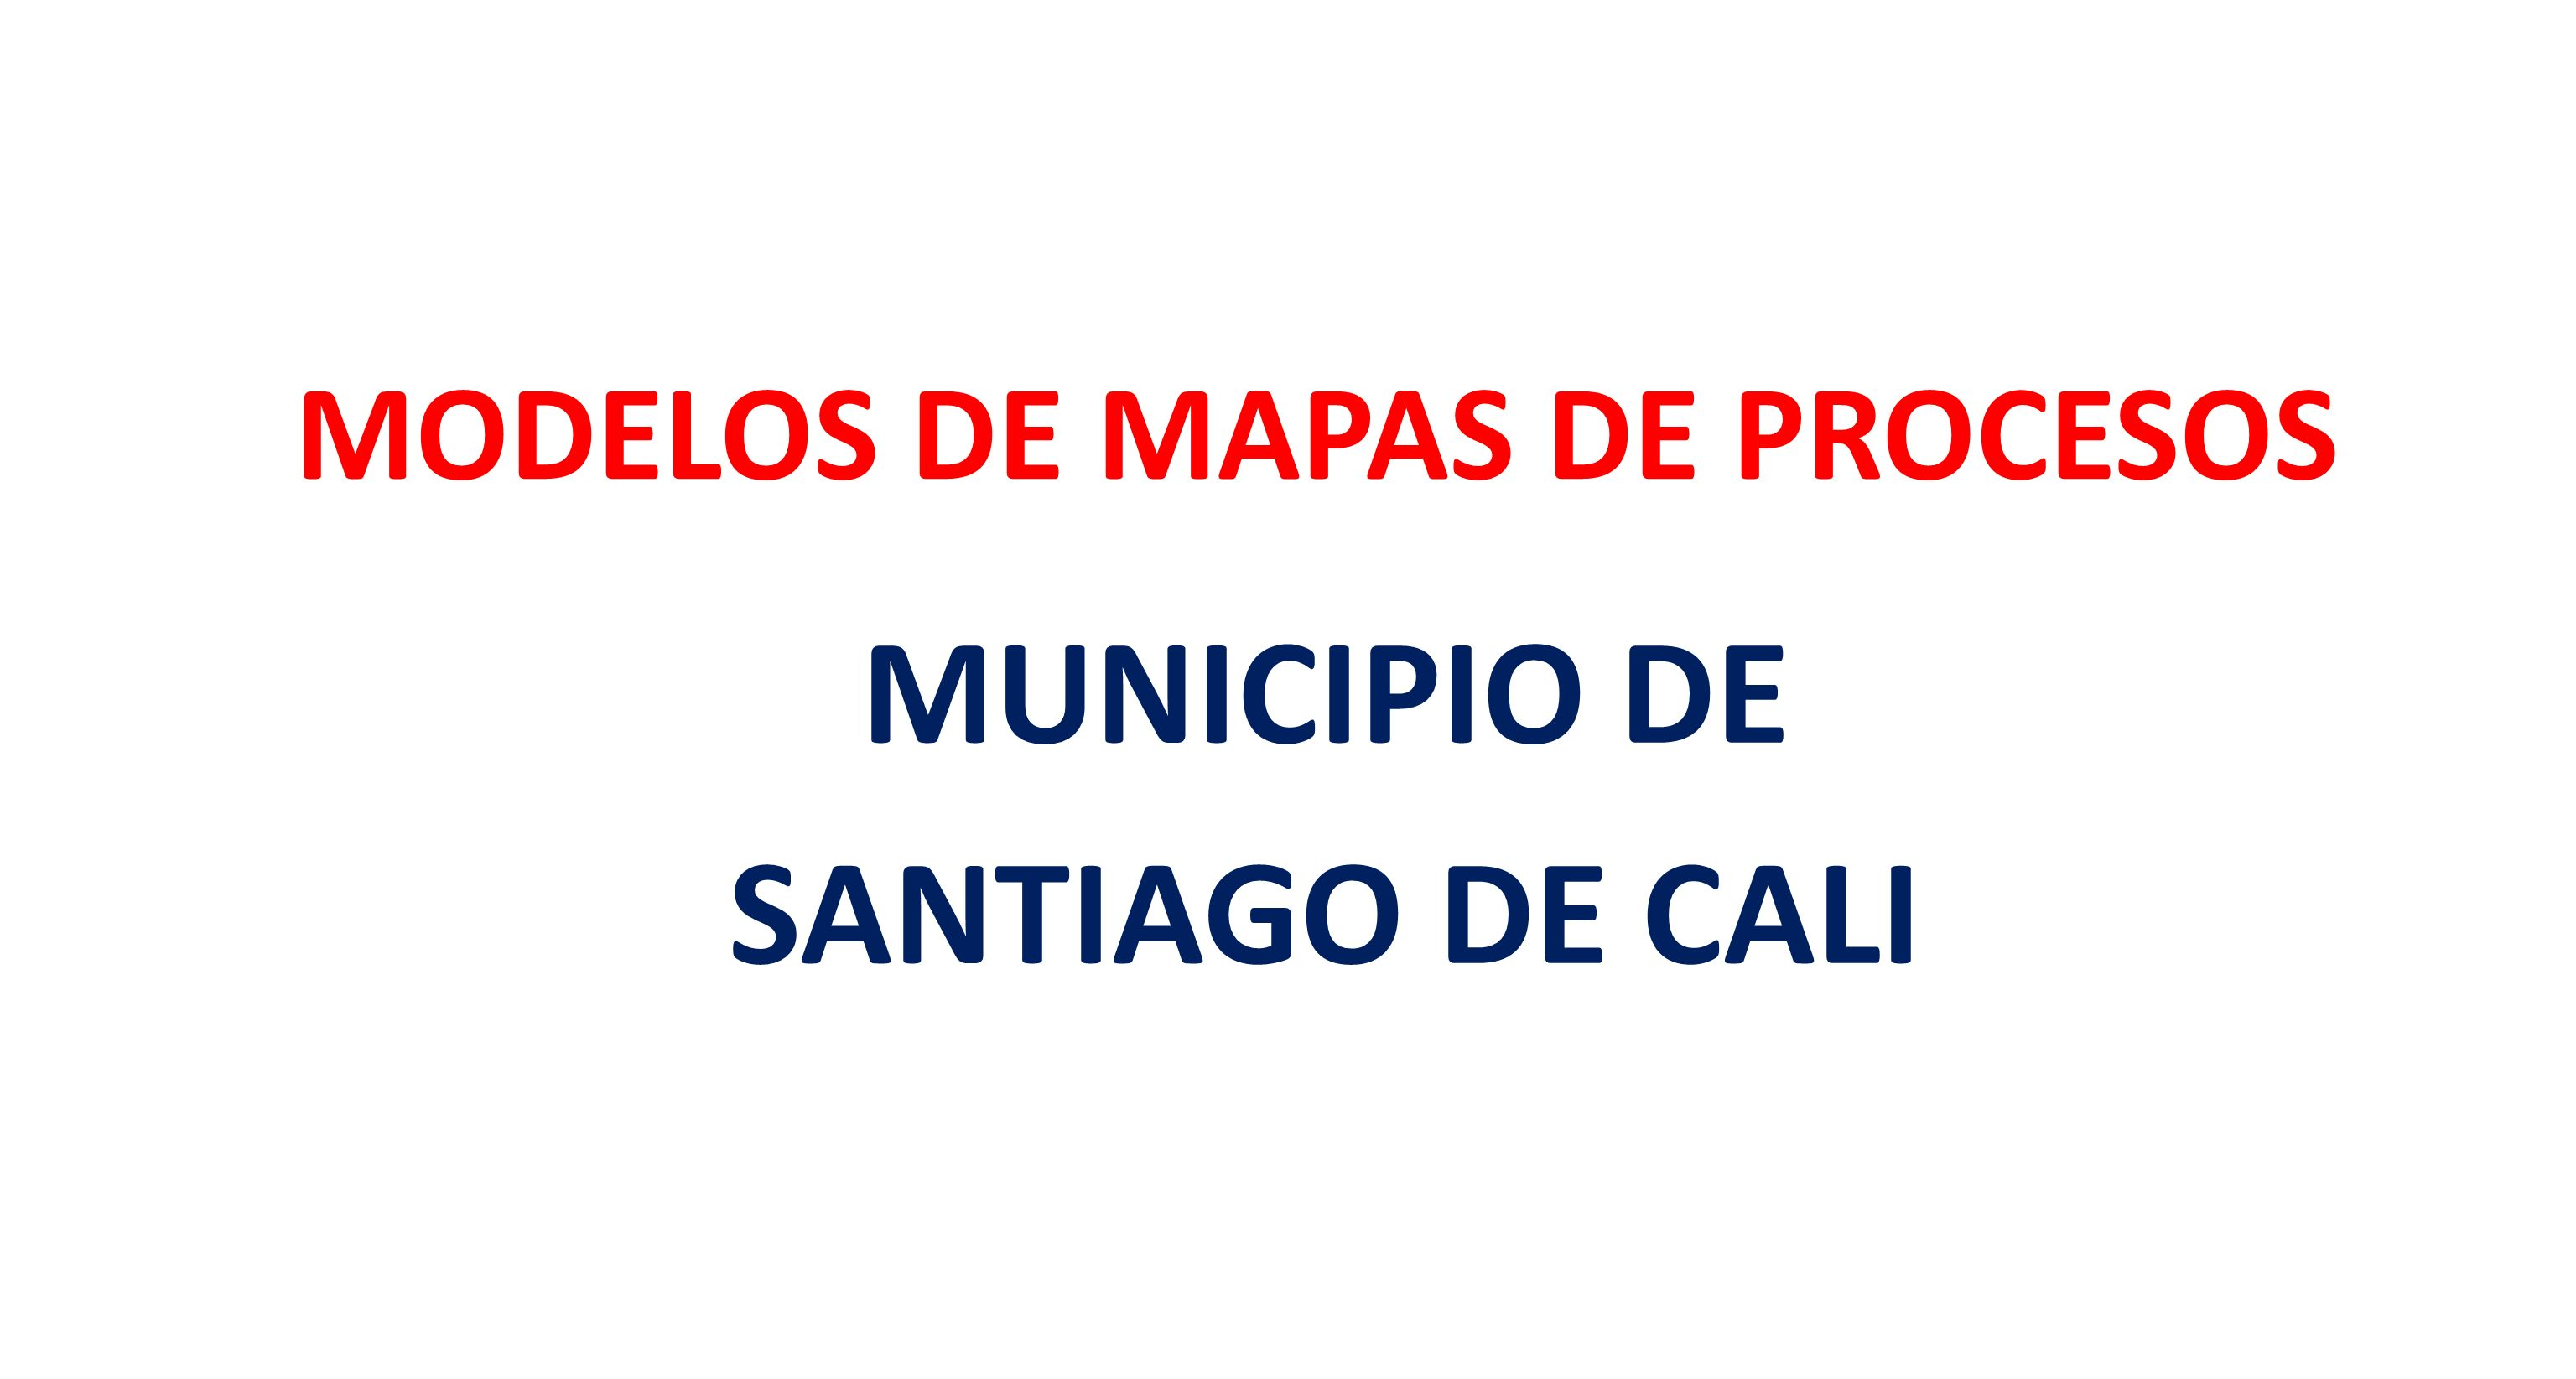 MODELOS DE MAPAS DE PROCESOS MUNICIPIO DE SANTIAGO DE CALI